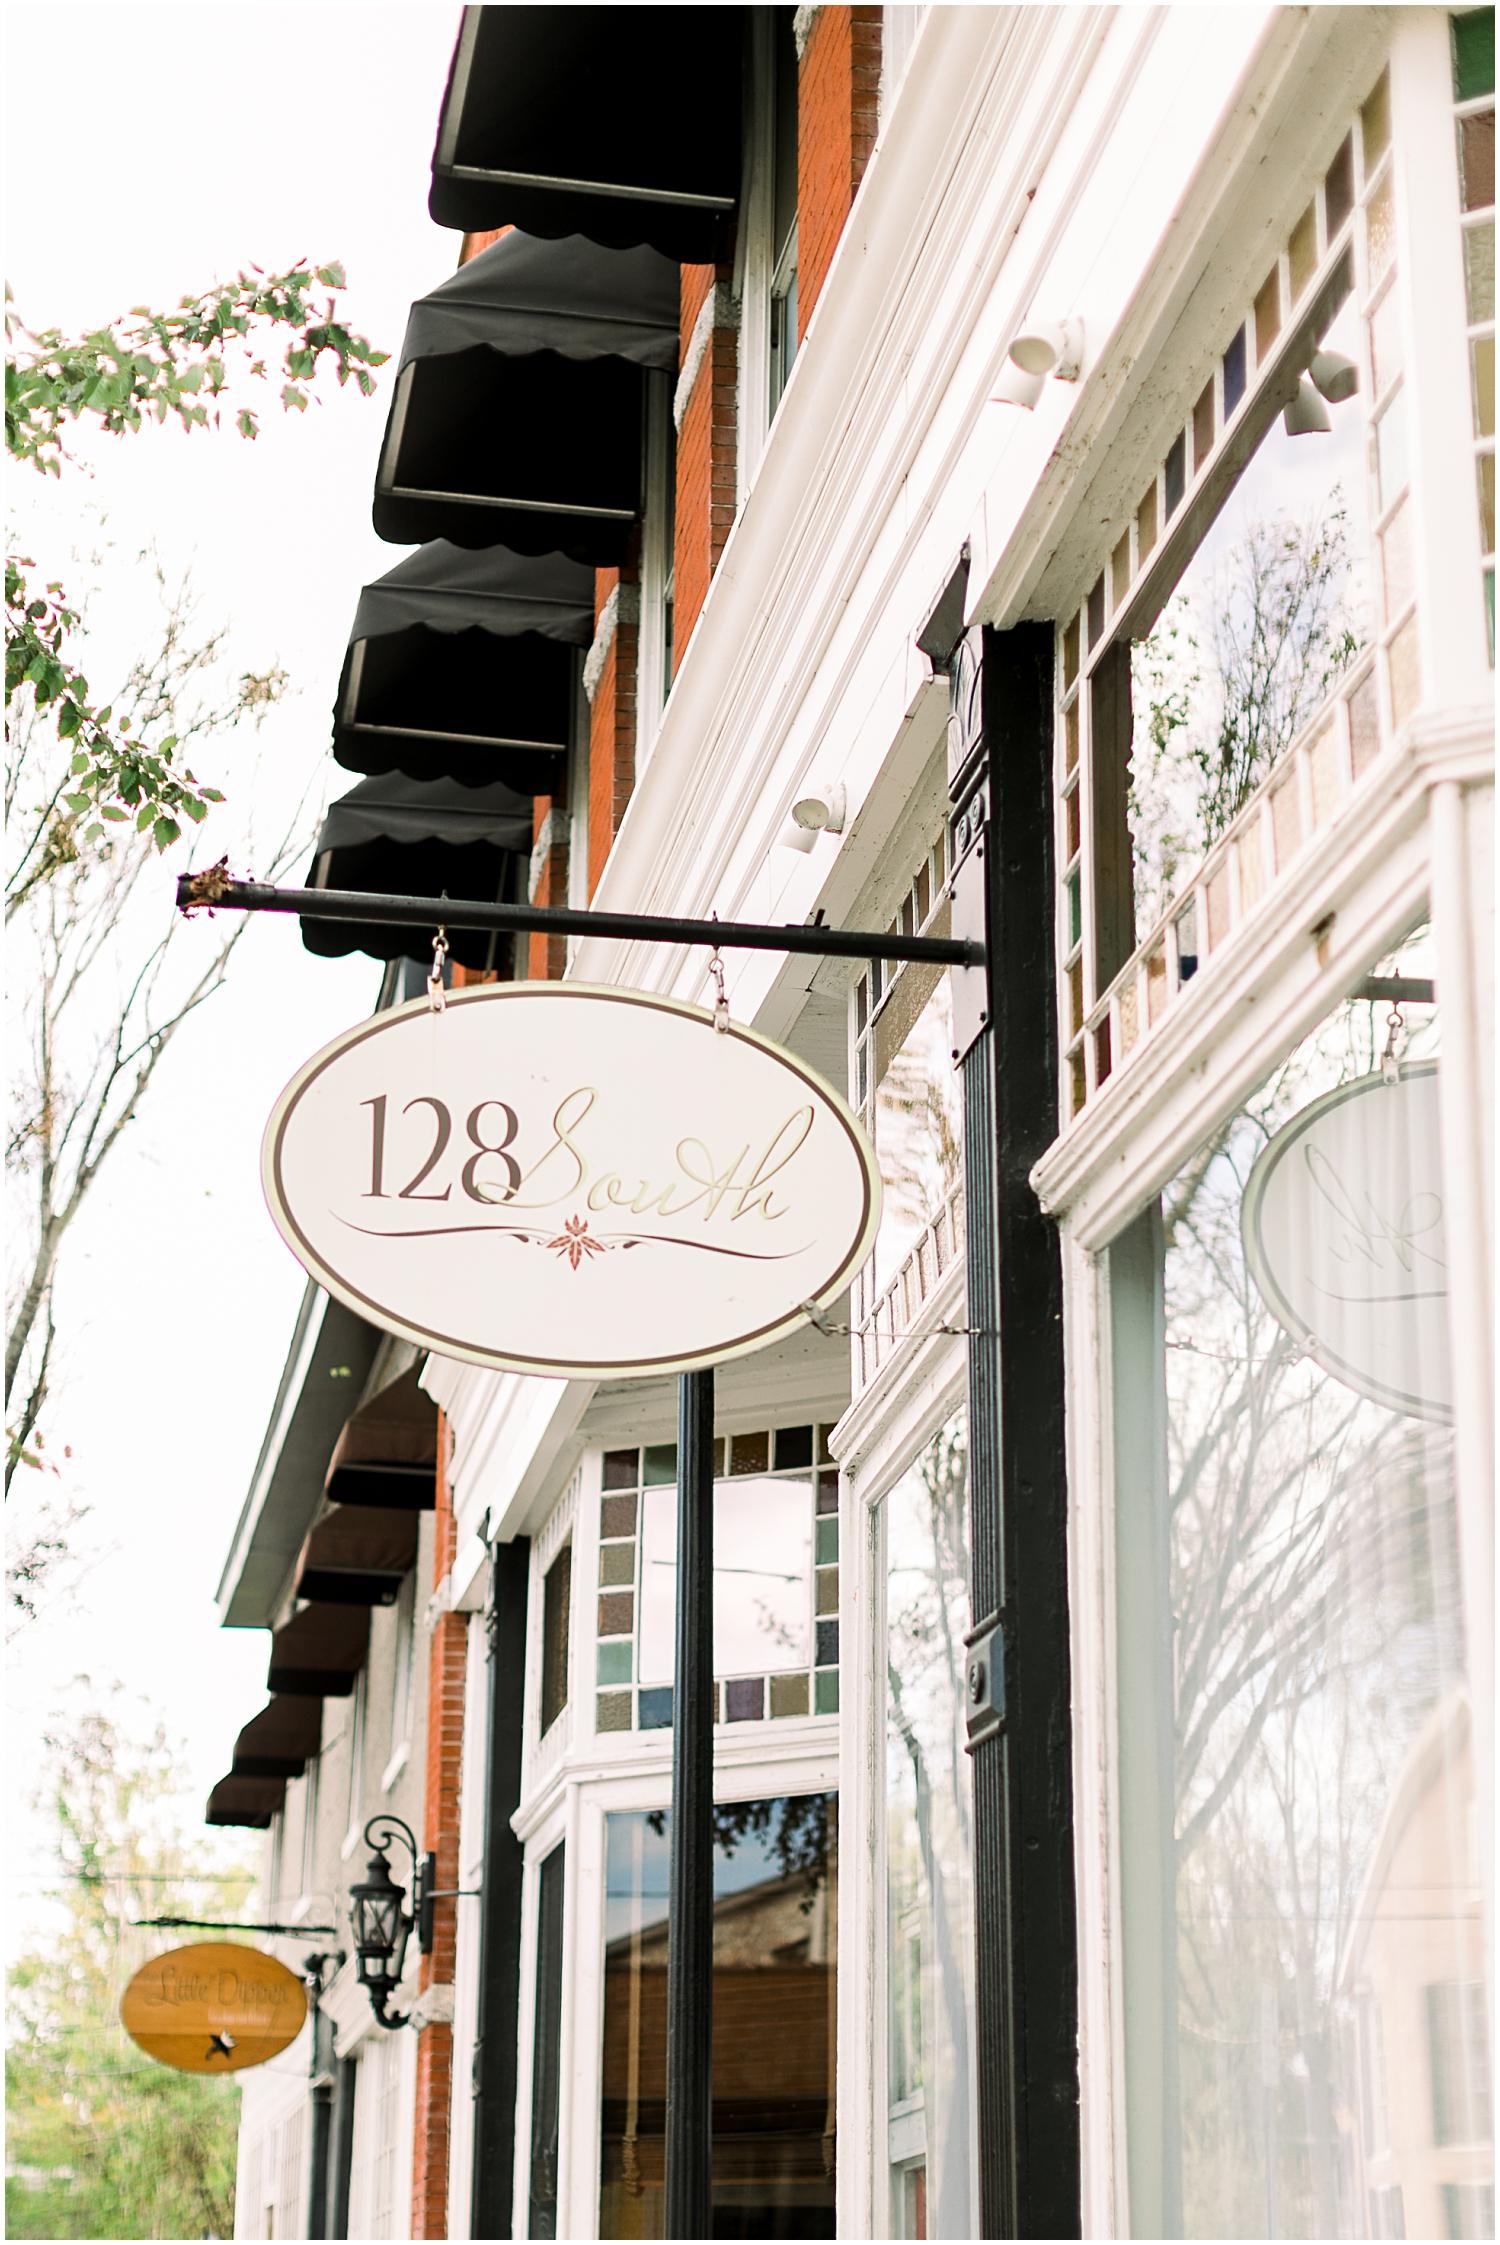 128 South Wedding venue, Downtown Wilmington NC Wedding_Erin L. Taylor Photography_0027.jpg